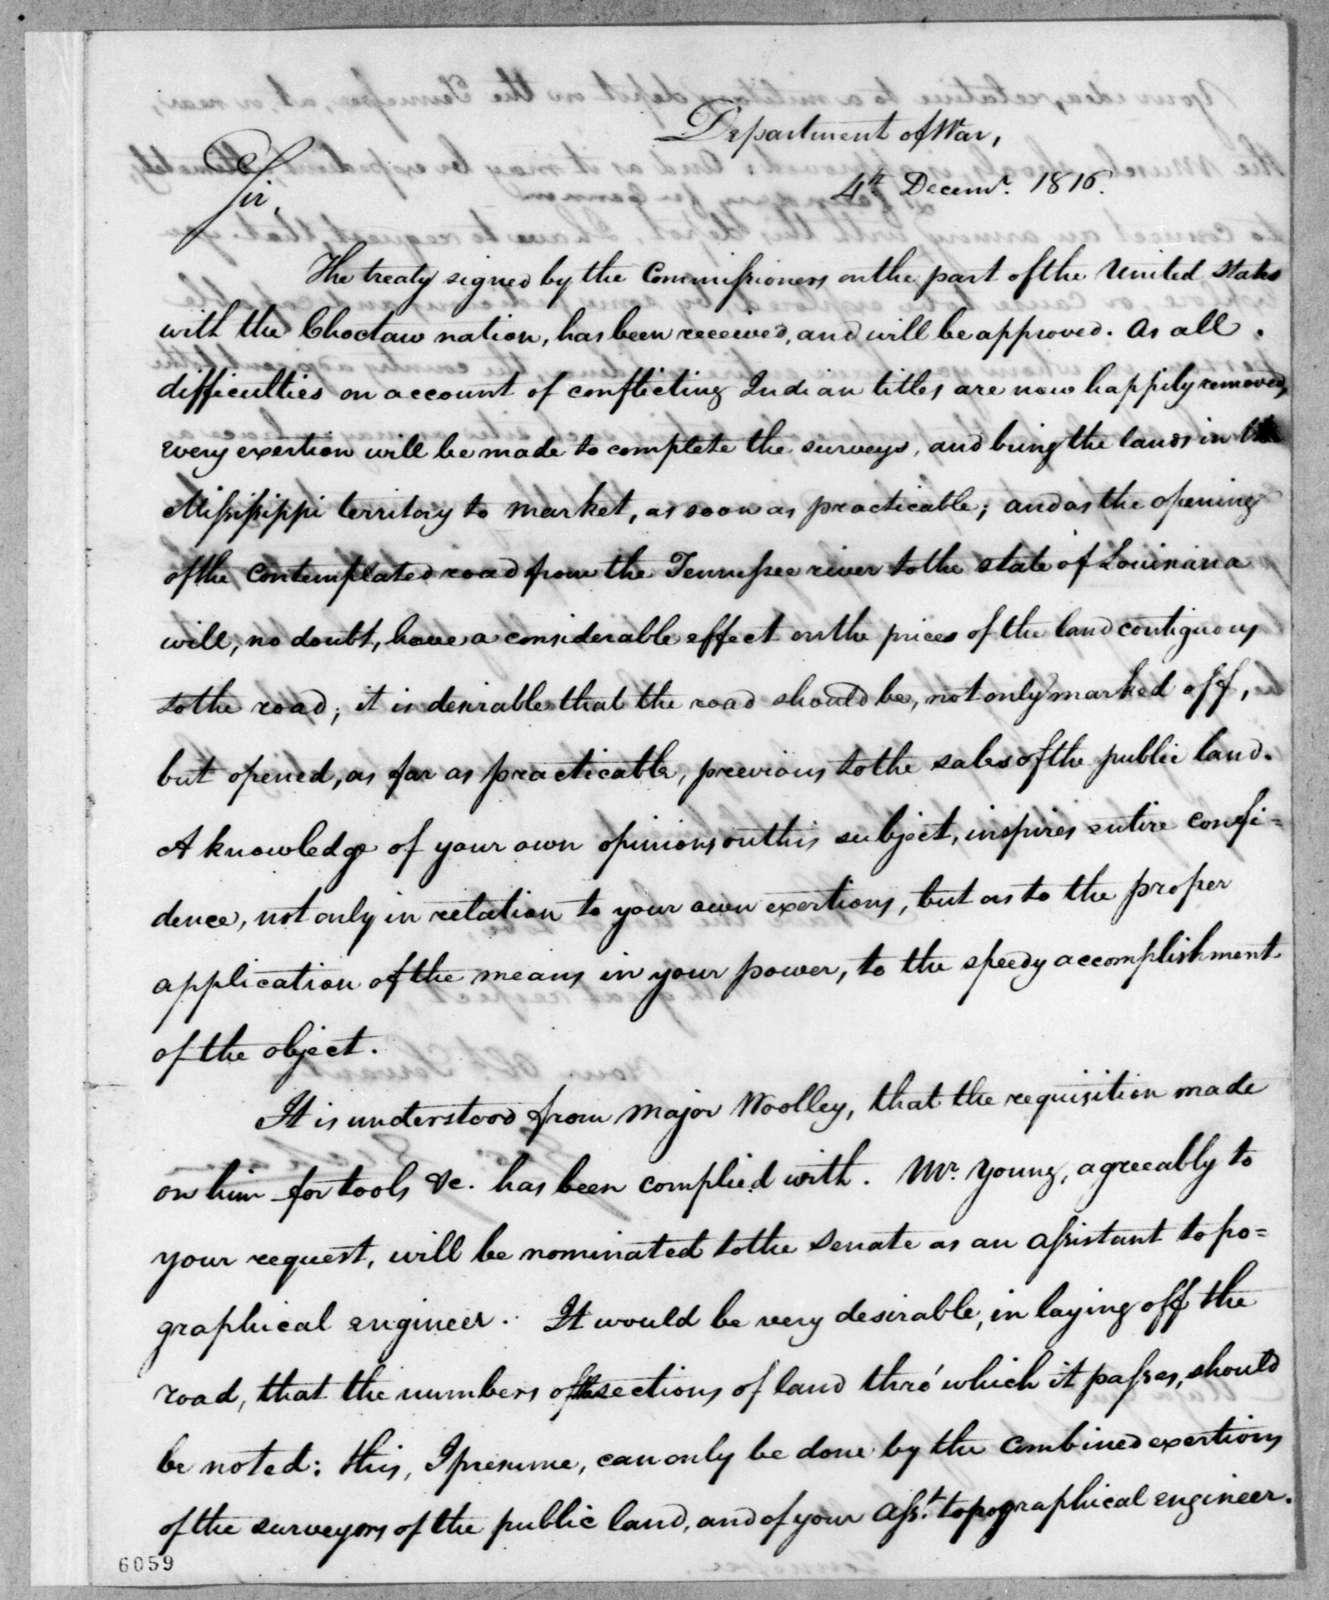 George Graham to Andrew Jackson, December 4, 1816